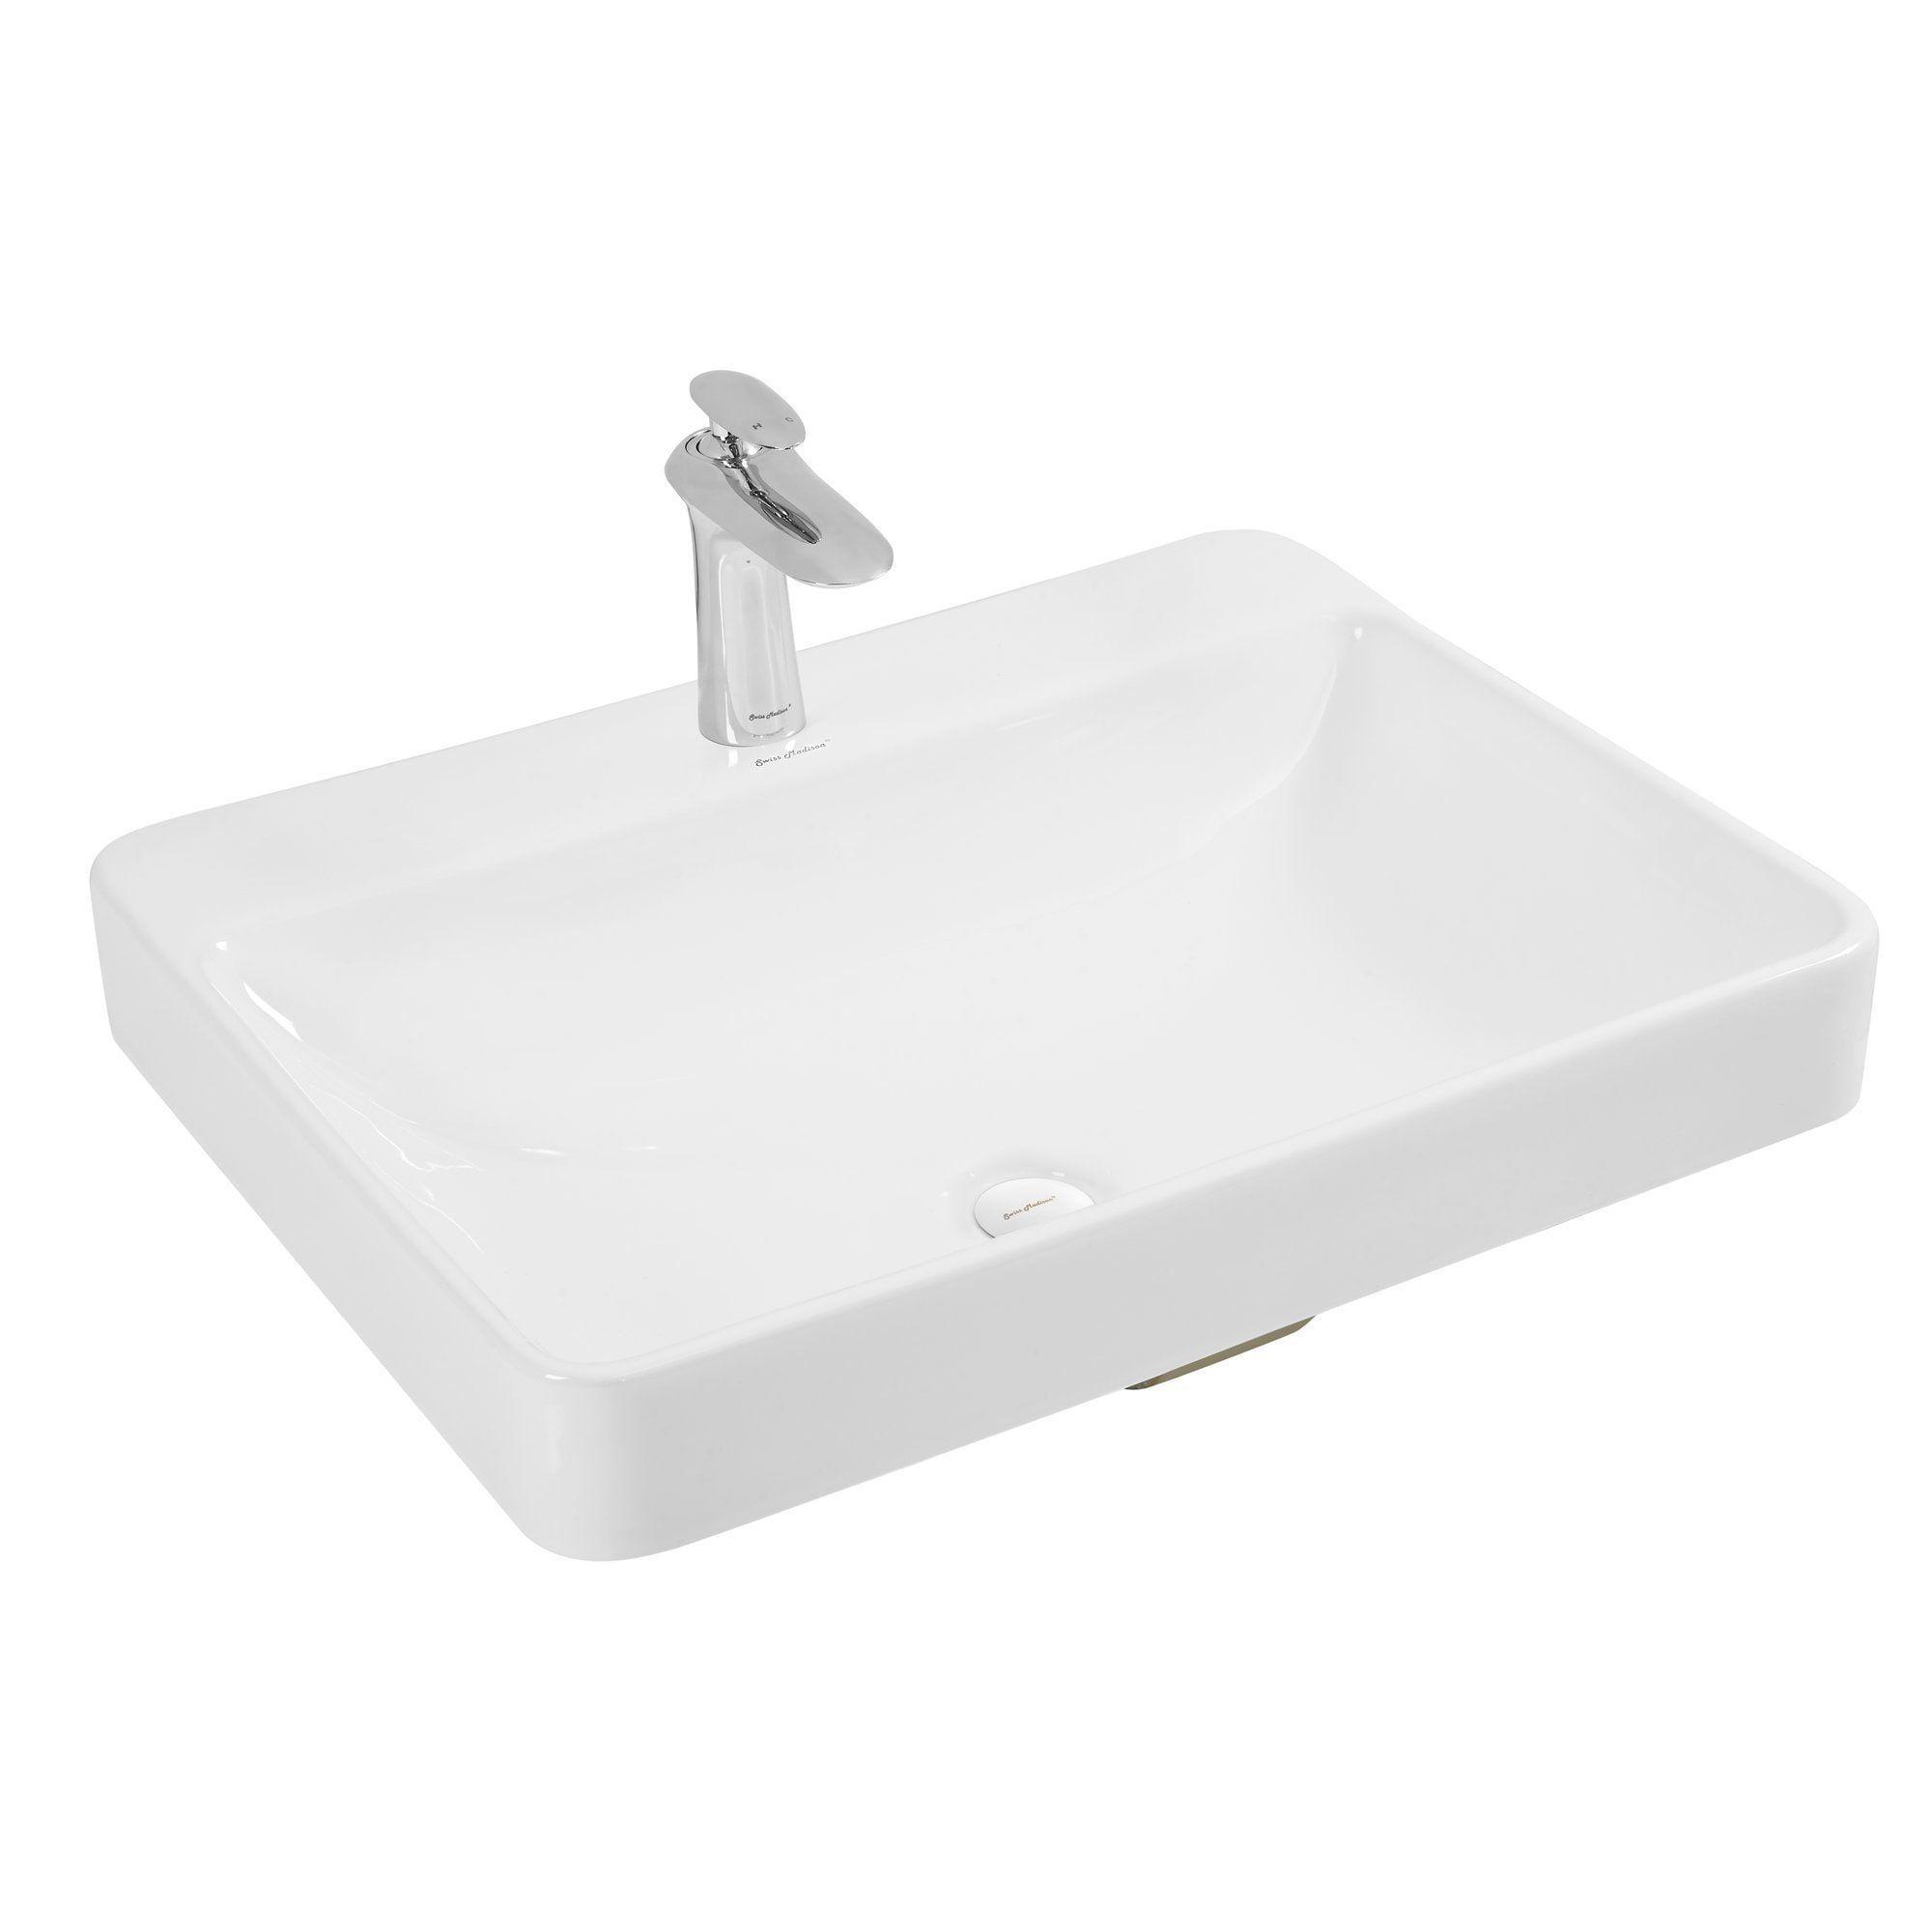 Online Shopping Bedding Furniture Electronics Jewelry Clothing More Rectangular Vessel Sink Sink Vessel Sink